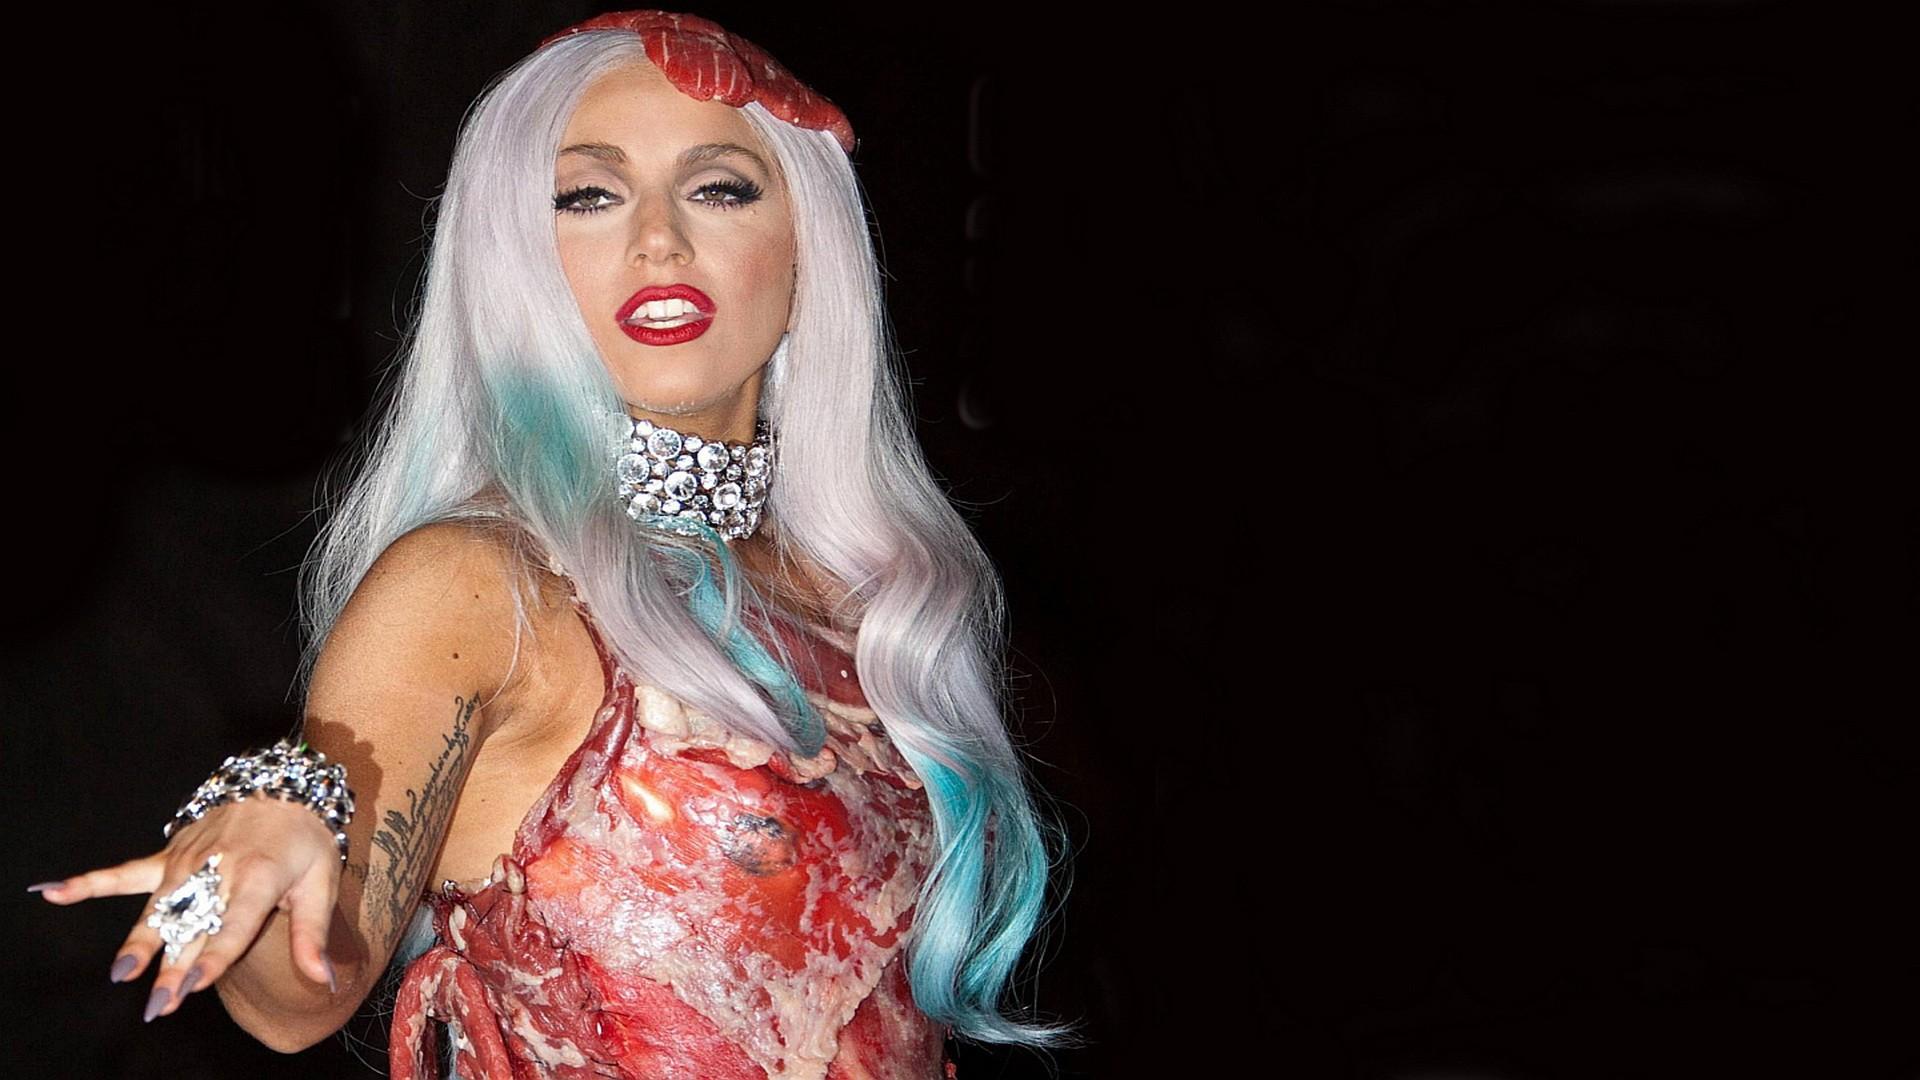 Lady Gaga For Desktop